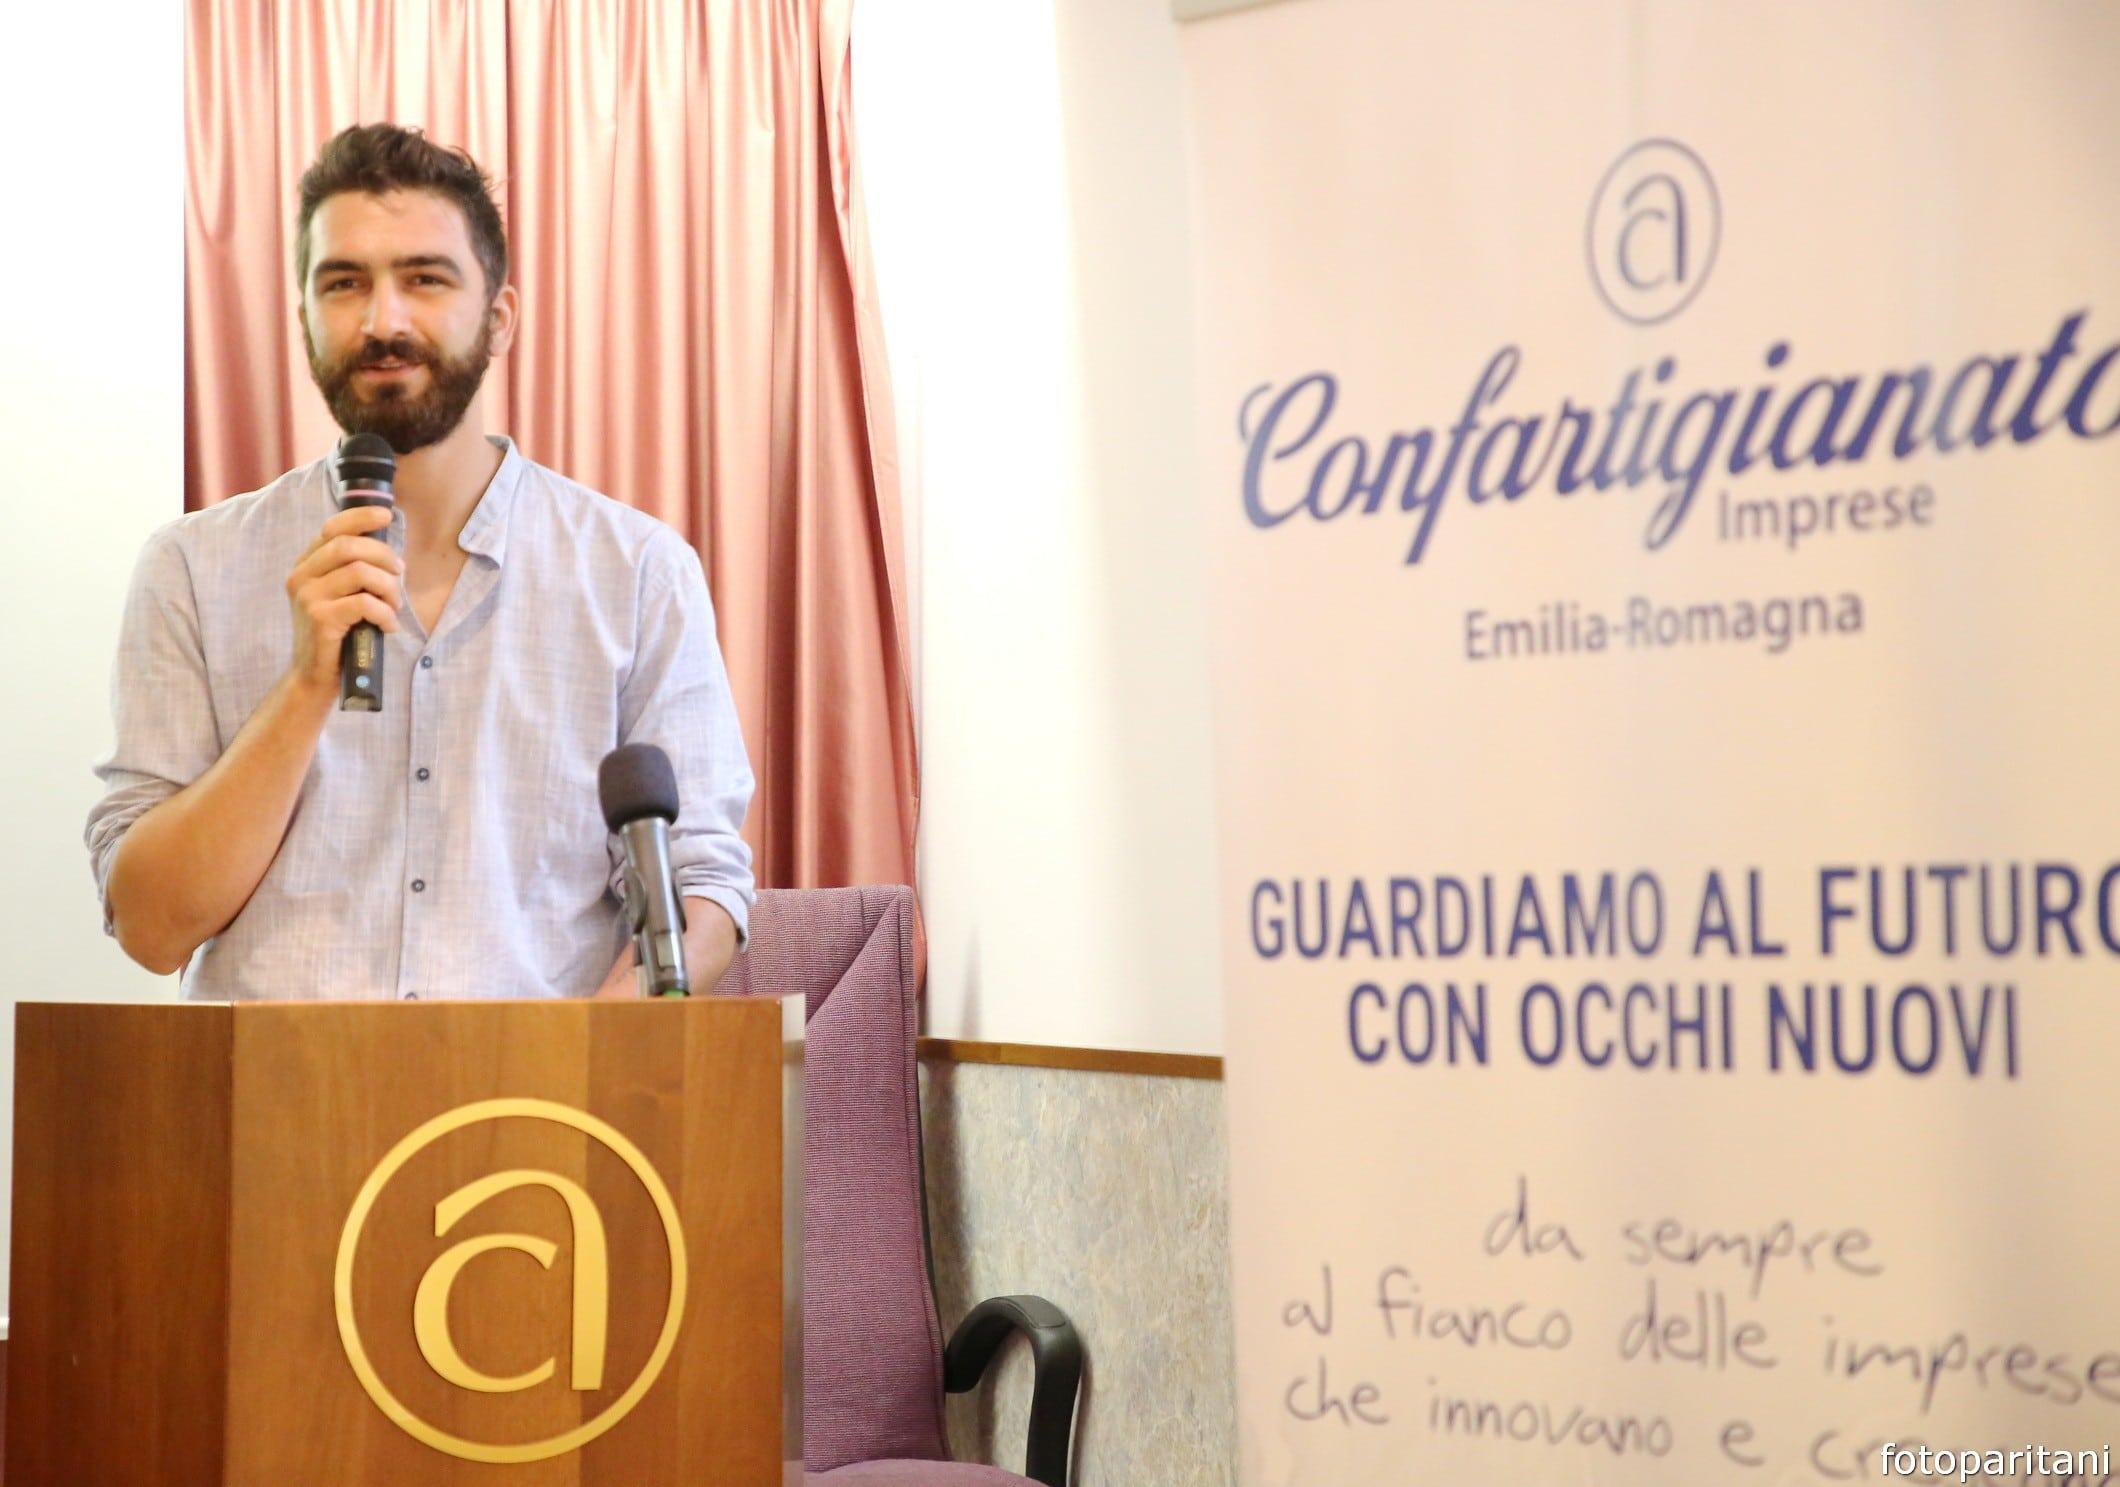 Lorenzo Bernardi presidente Gruppo Giovani Imprenditori Confartigianato Emilia Romagna assemblea Rimini 28 luglio 2021